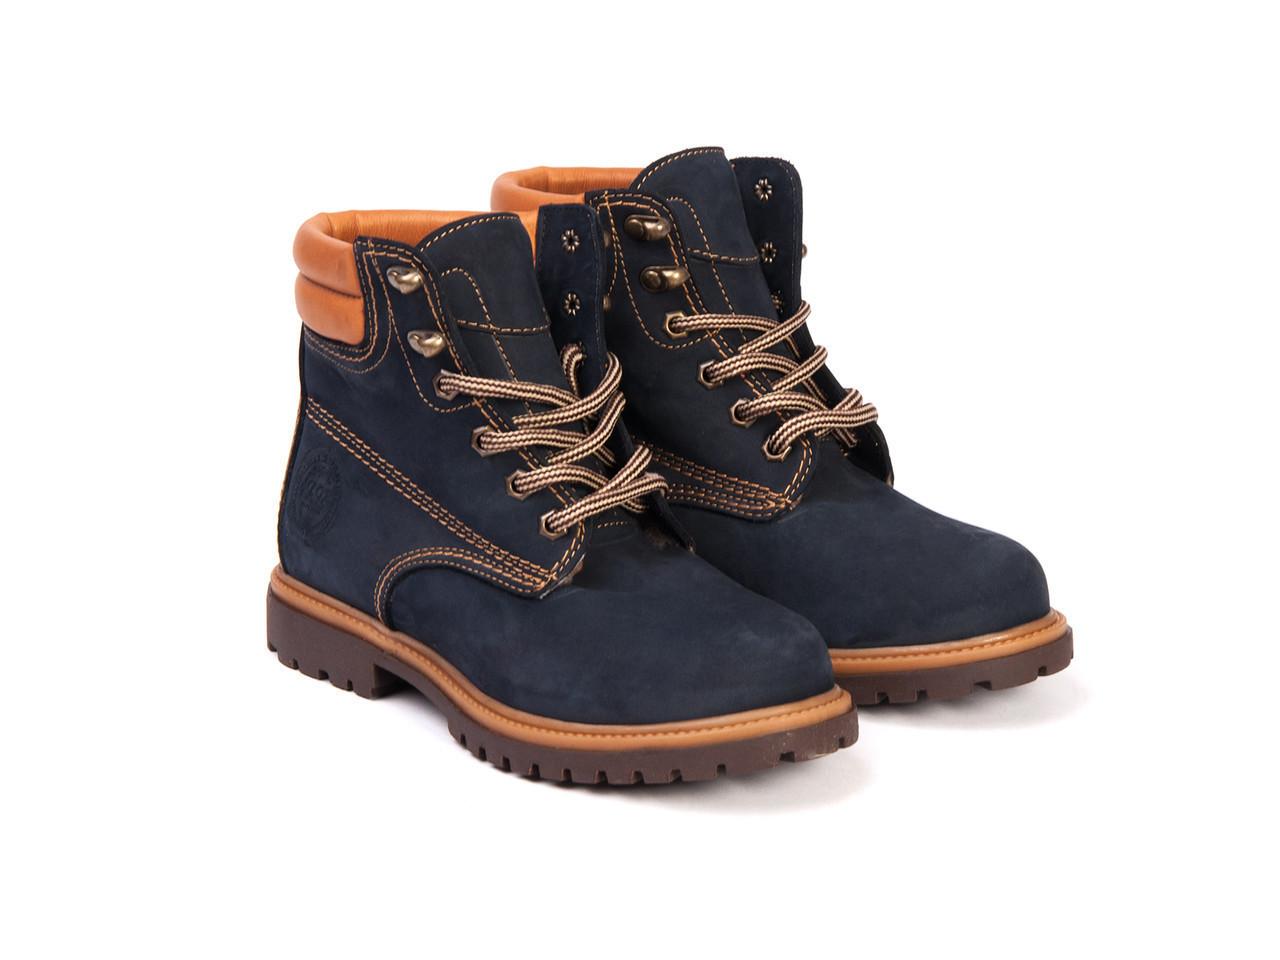 Ботинки Etor 2852-4310-2298 39 синие